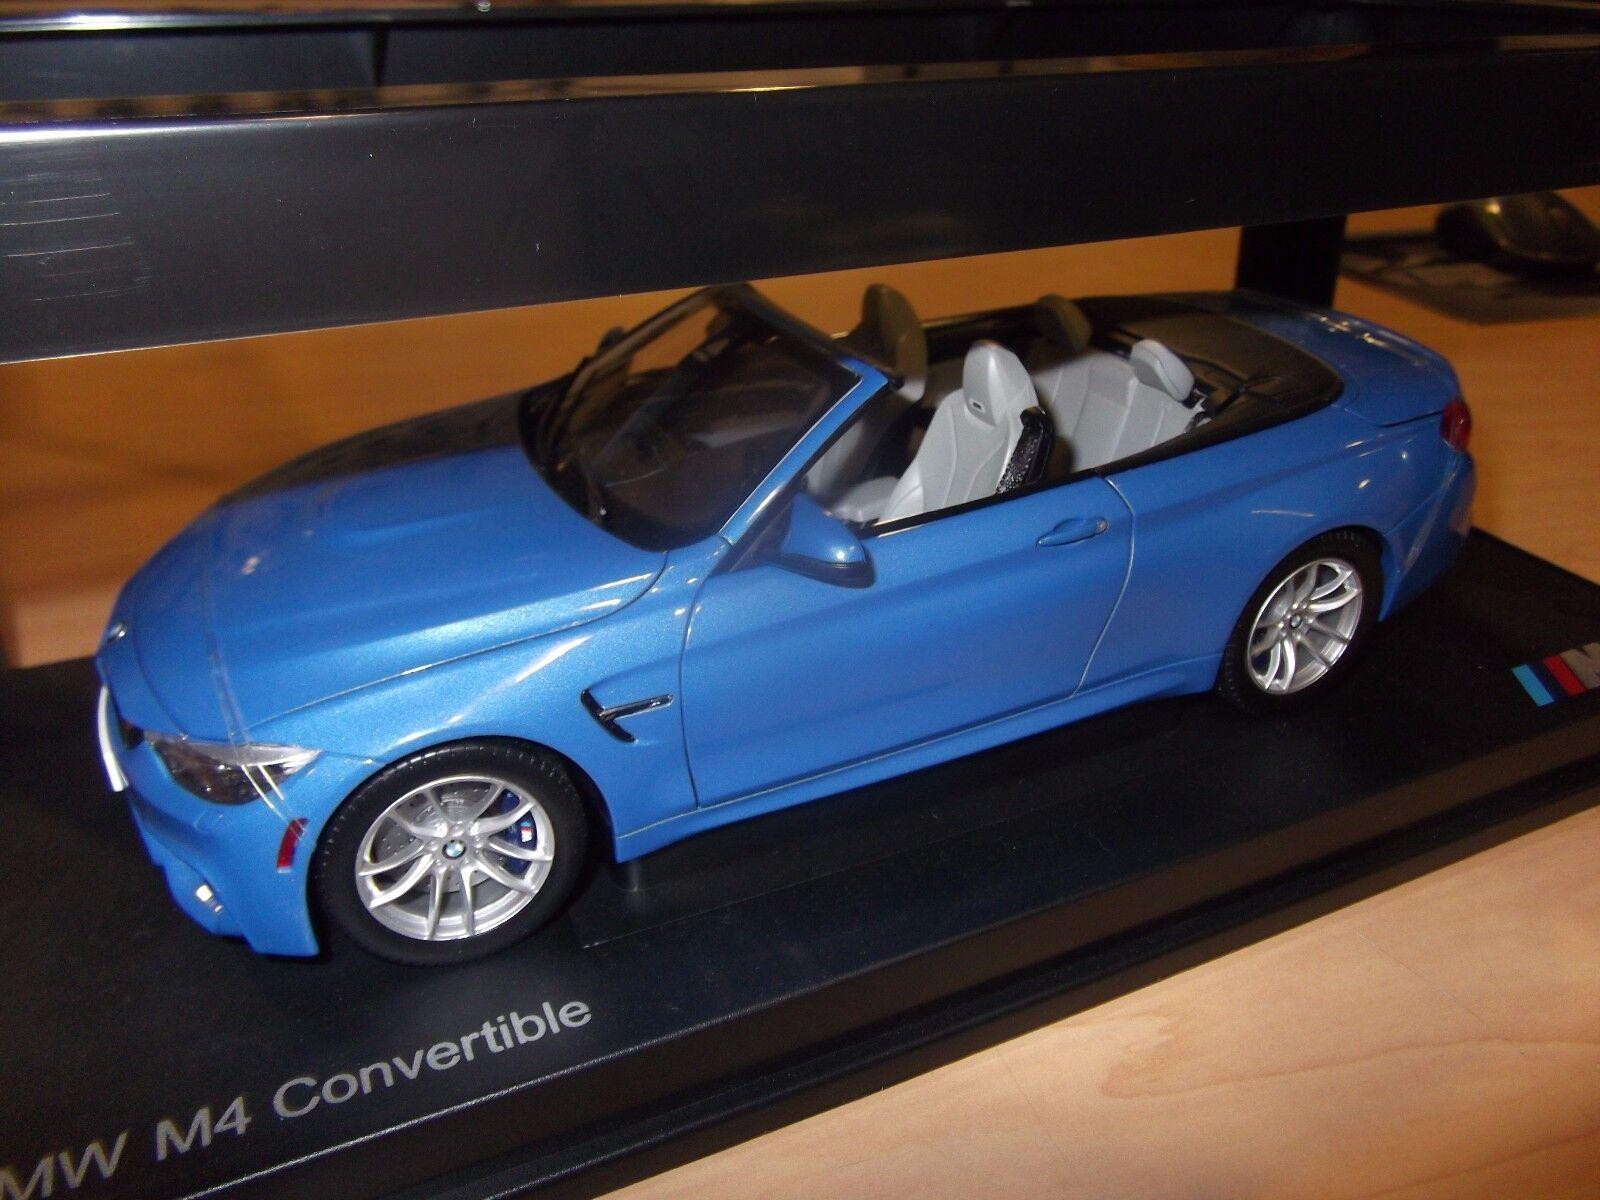 BMW M4 CABRIOLET F83 1 18 scale model miniature voiture bleu 80432339612 OEM